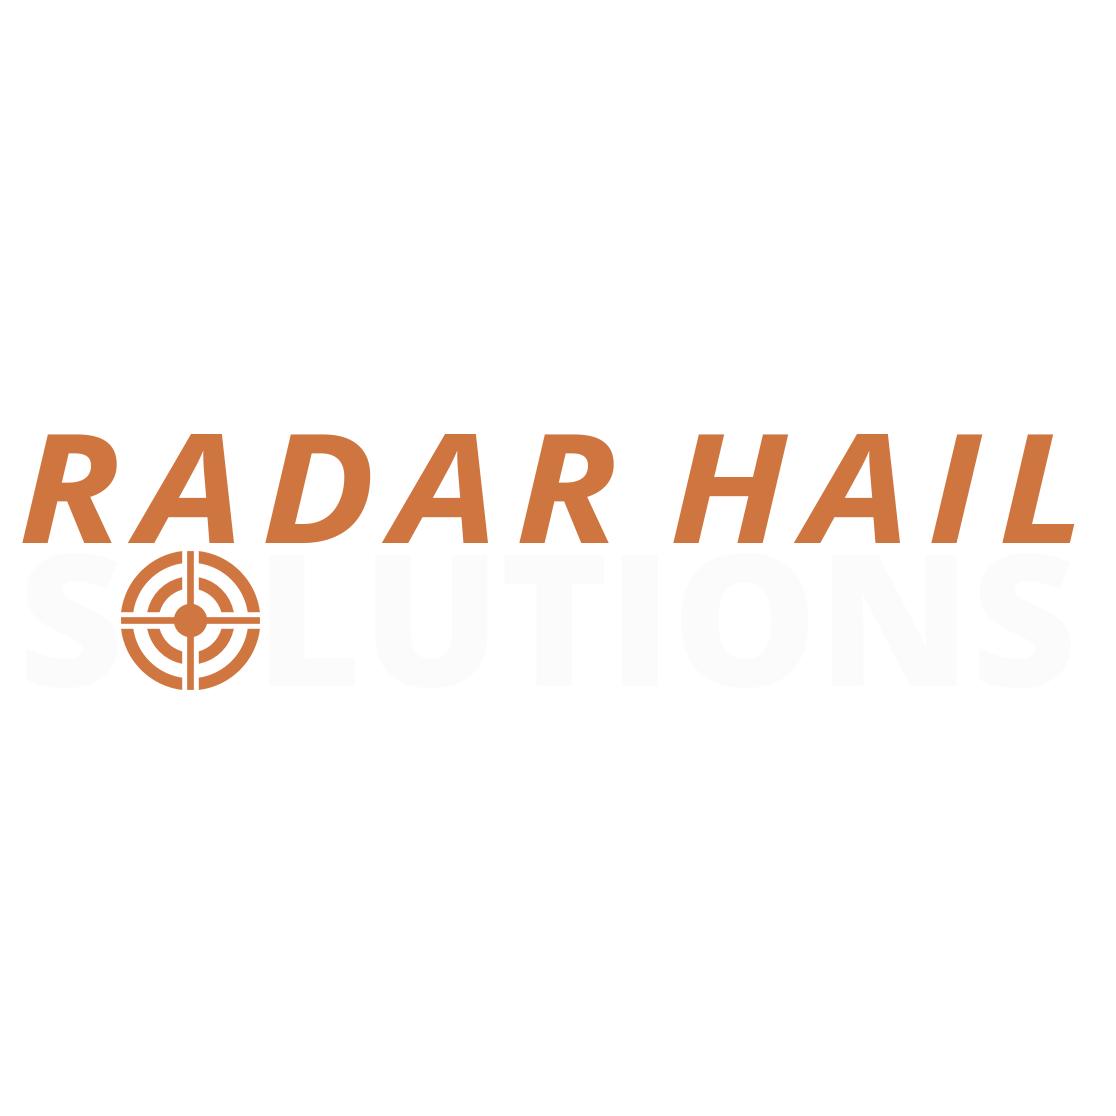 Radar Hail Solutions